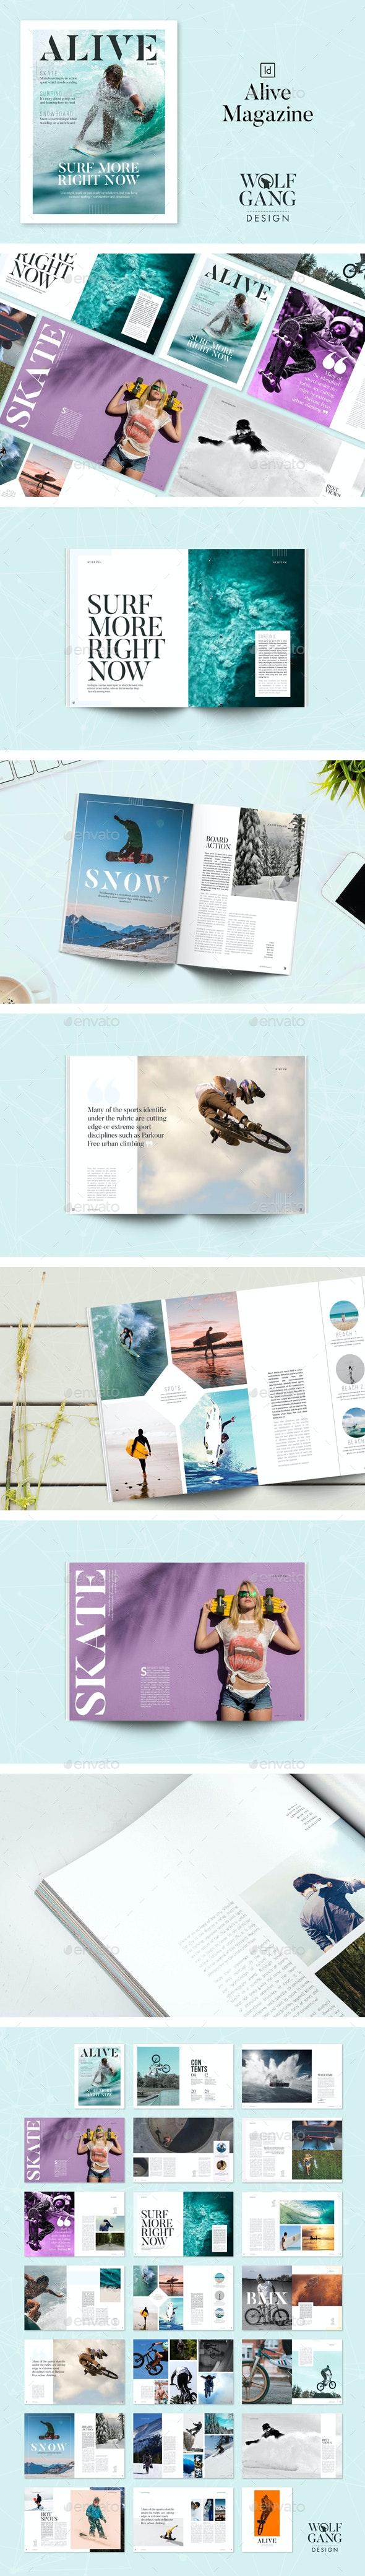 Alive Magazine Template - Magazines Print Templates